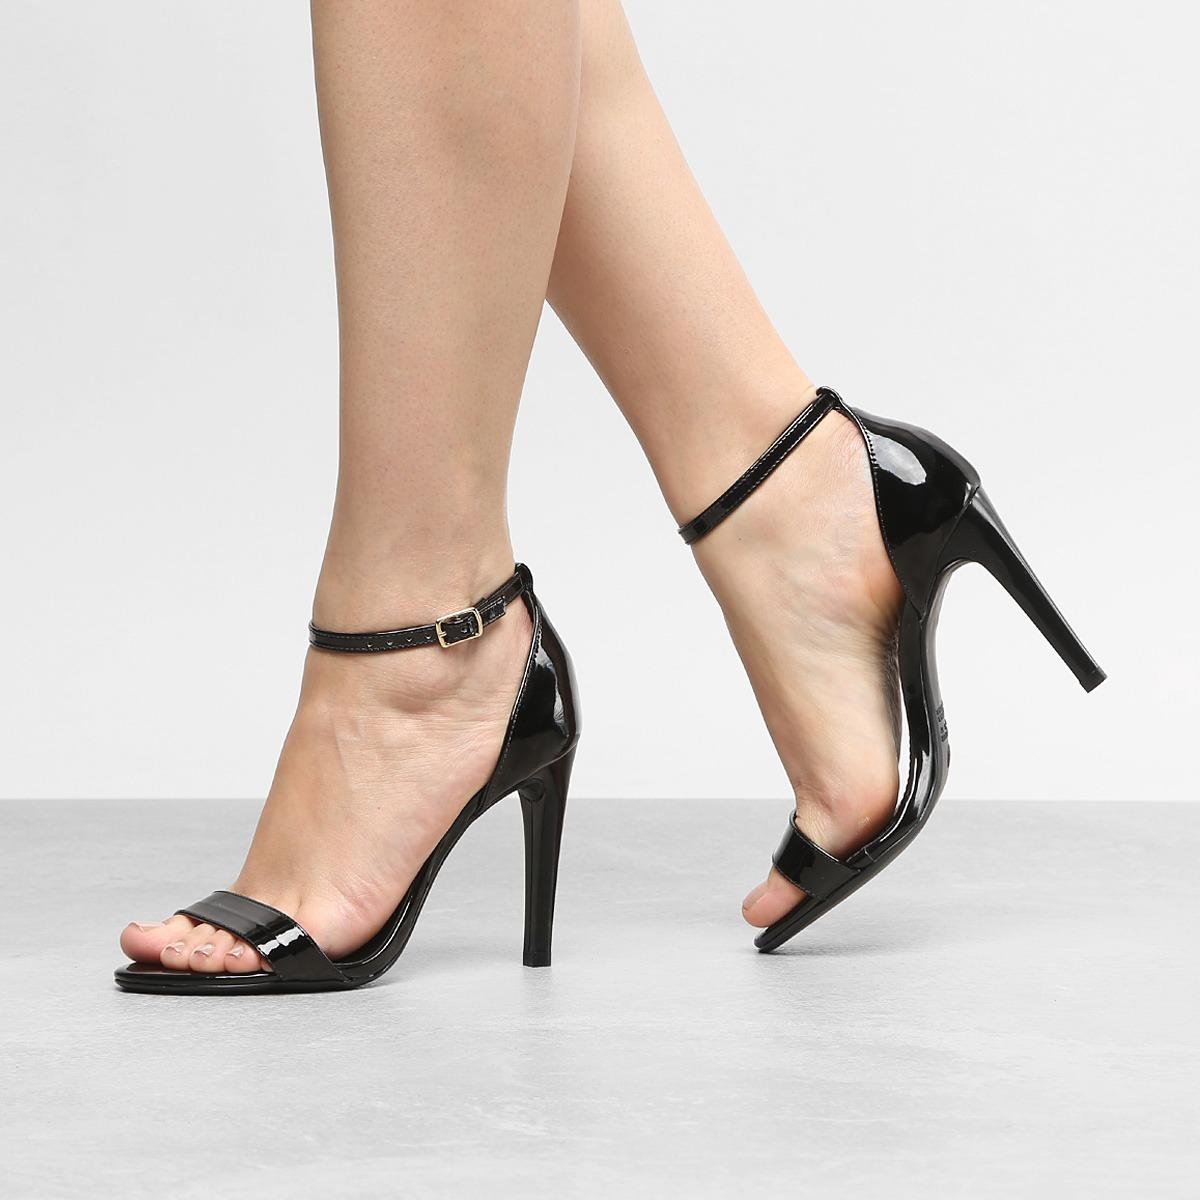 bd101c1552 sandalia feminina salto fino tira transparente 1909845. Carregando zoom.